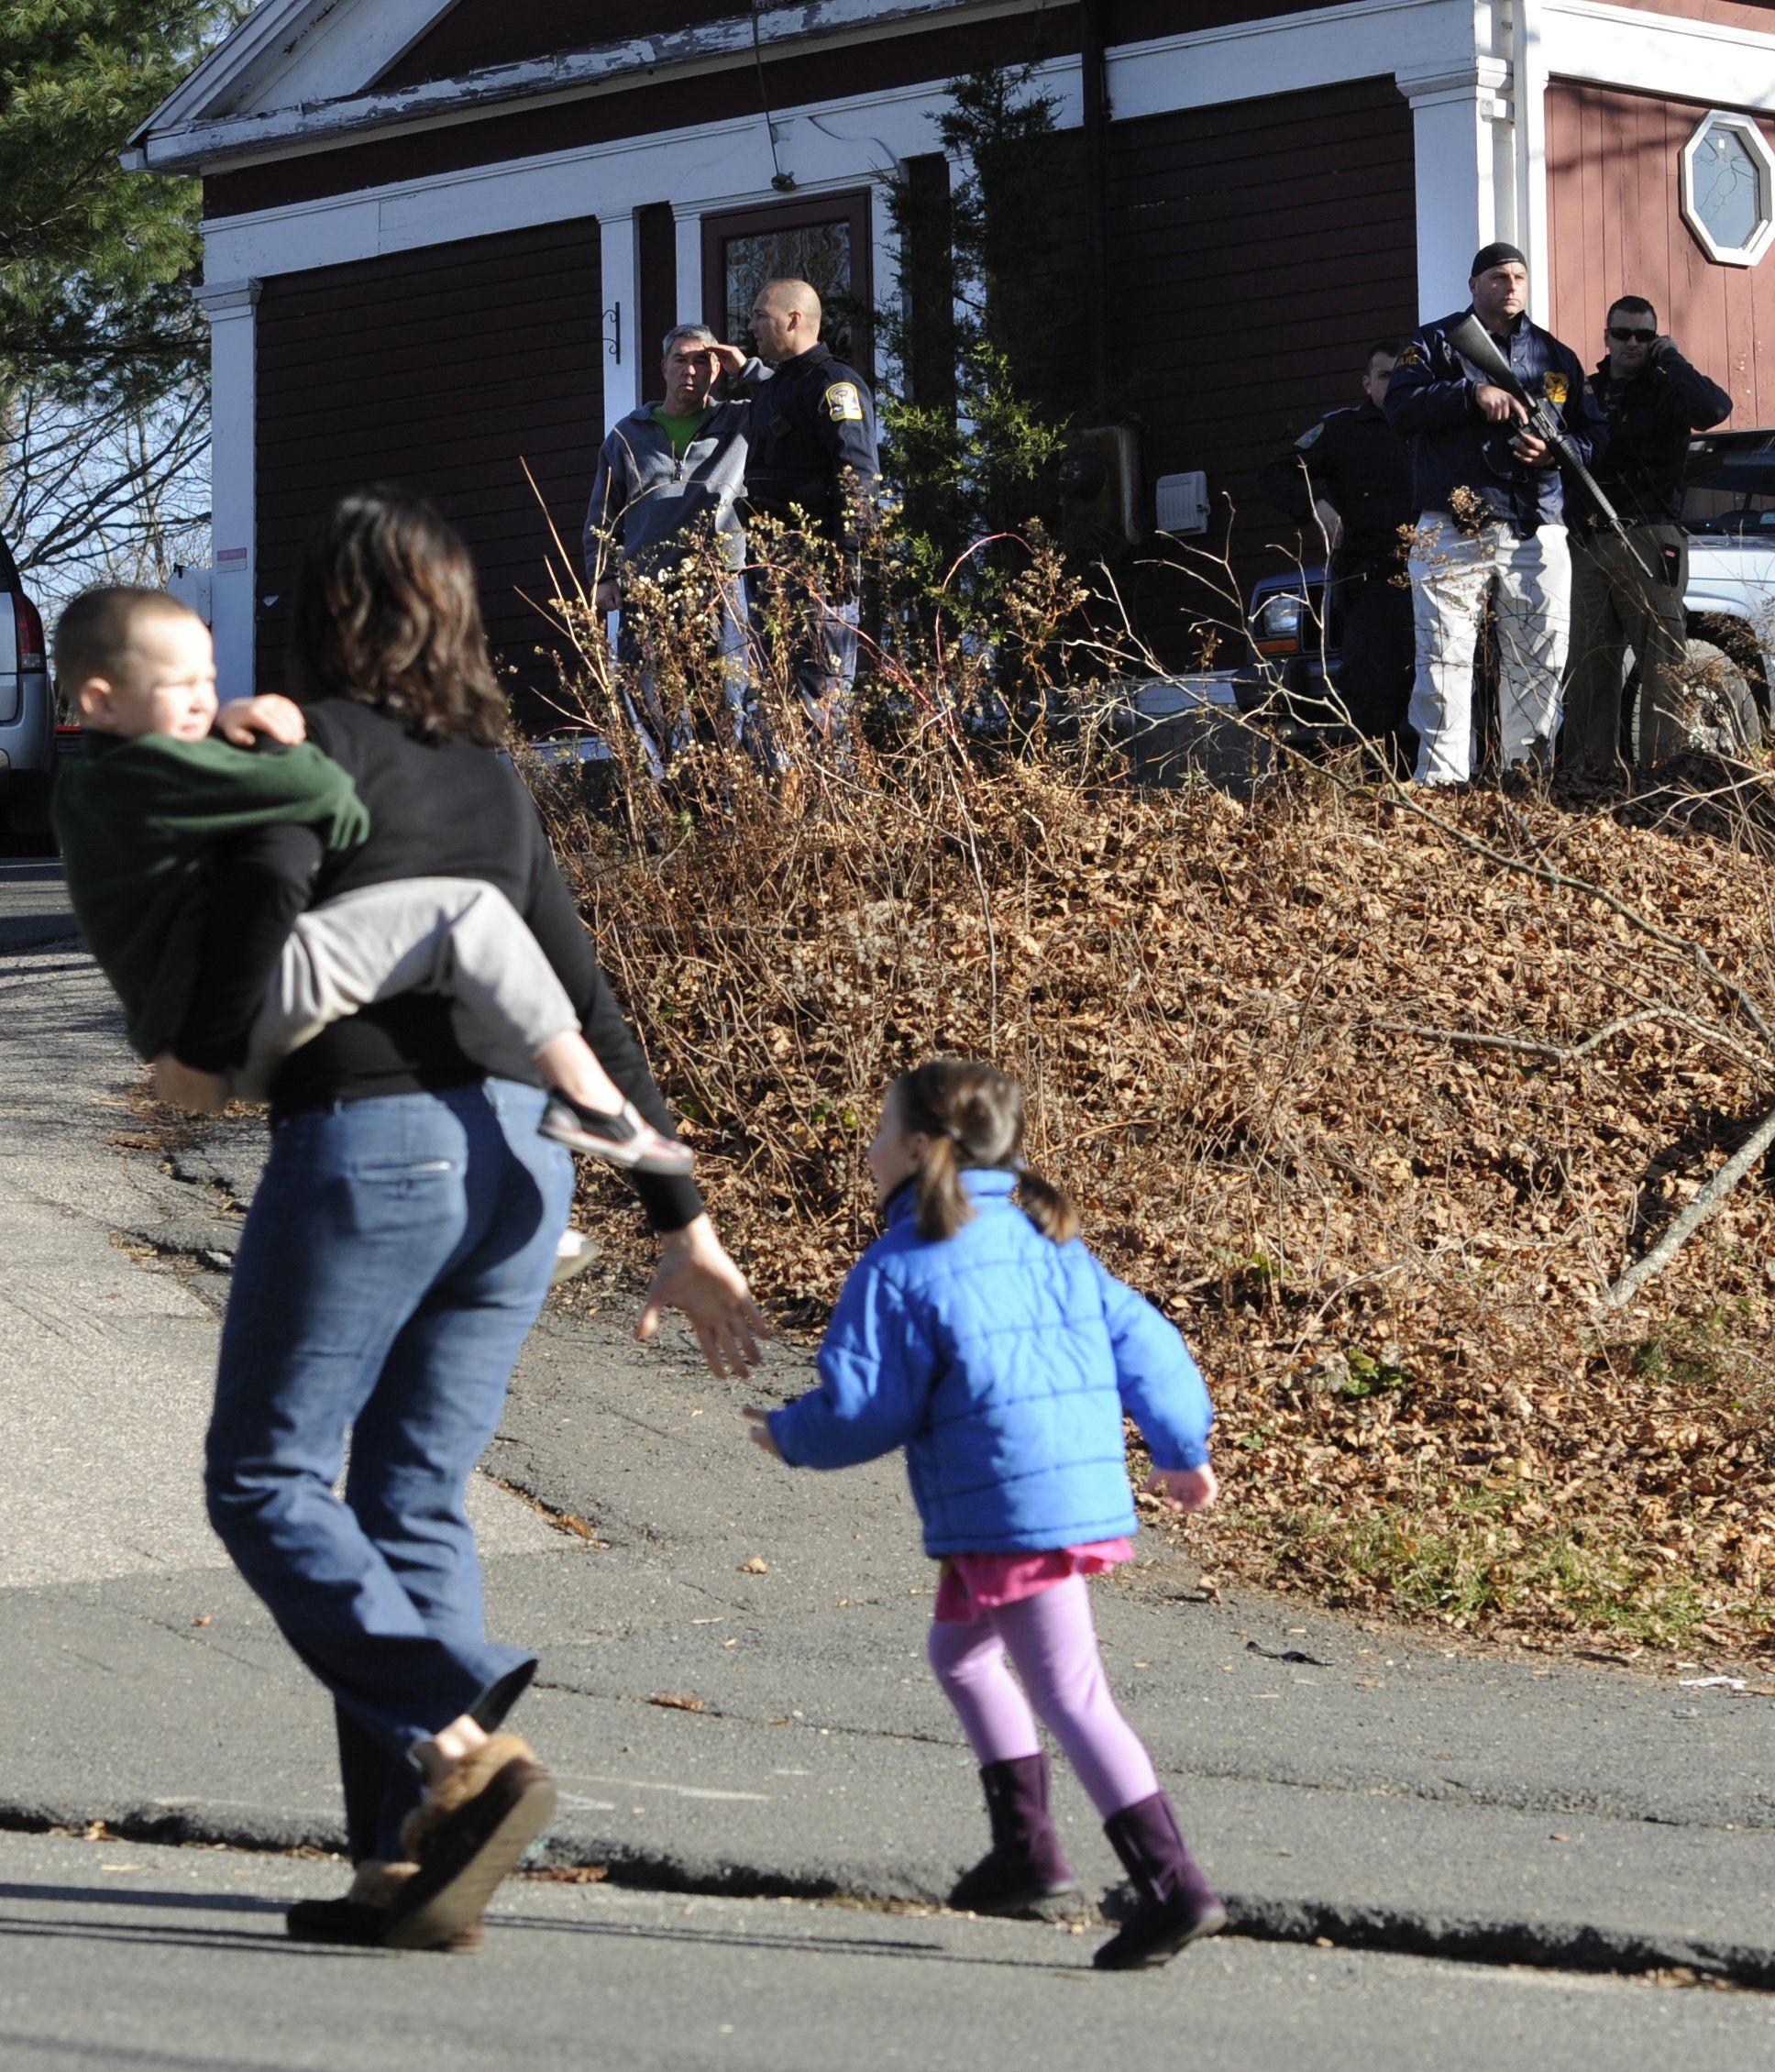 School Shooting Facts: Sandy Hook Elementary Shooting